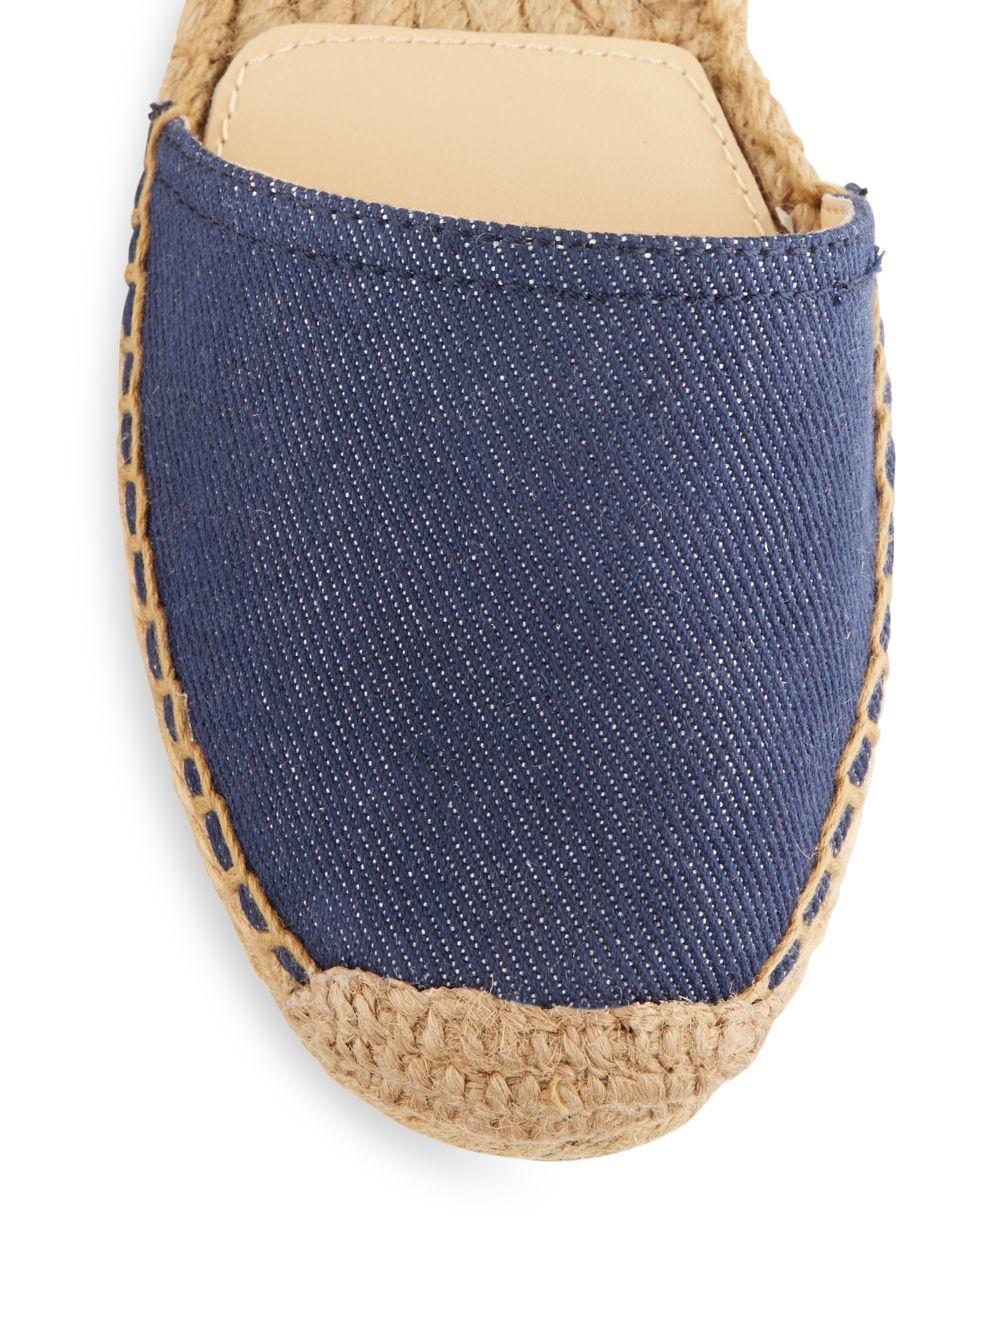 Vince Camuto Cable Denim Leather Ankle Strap Espadrilles